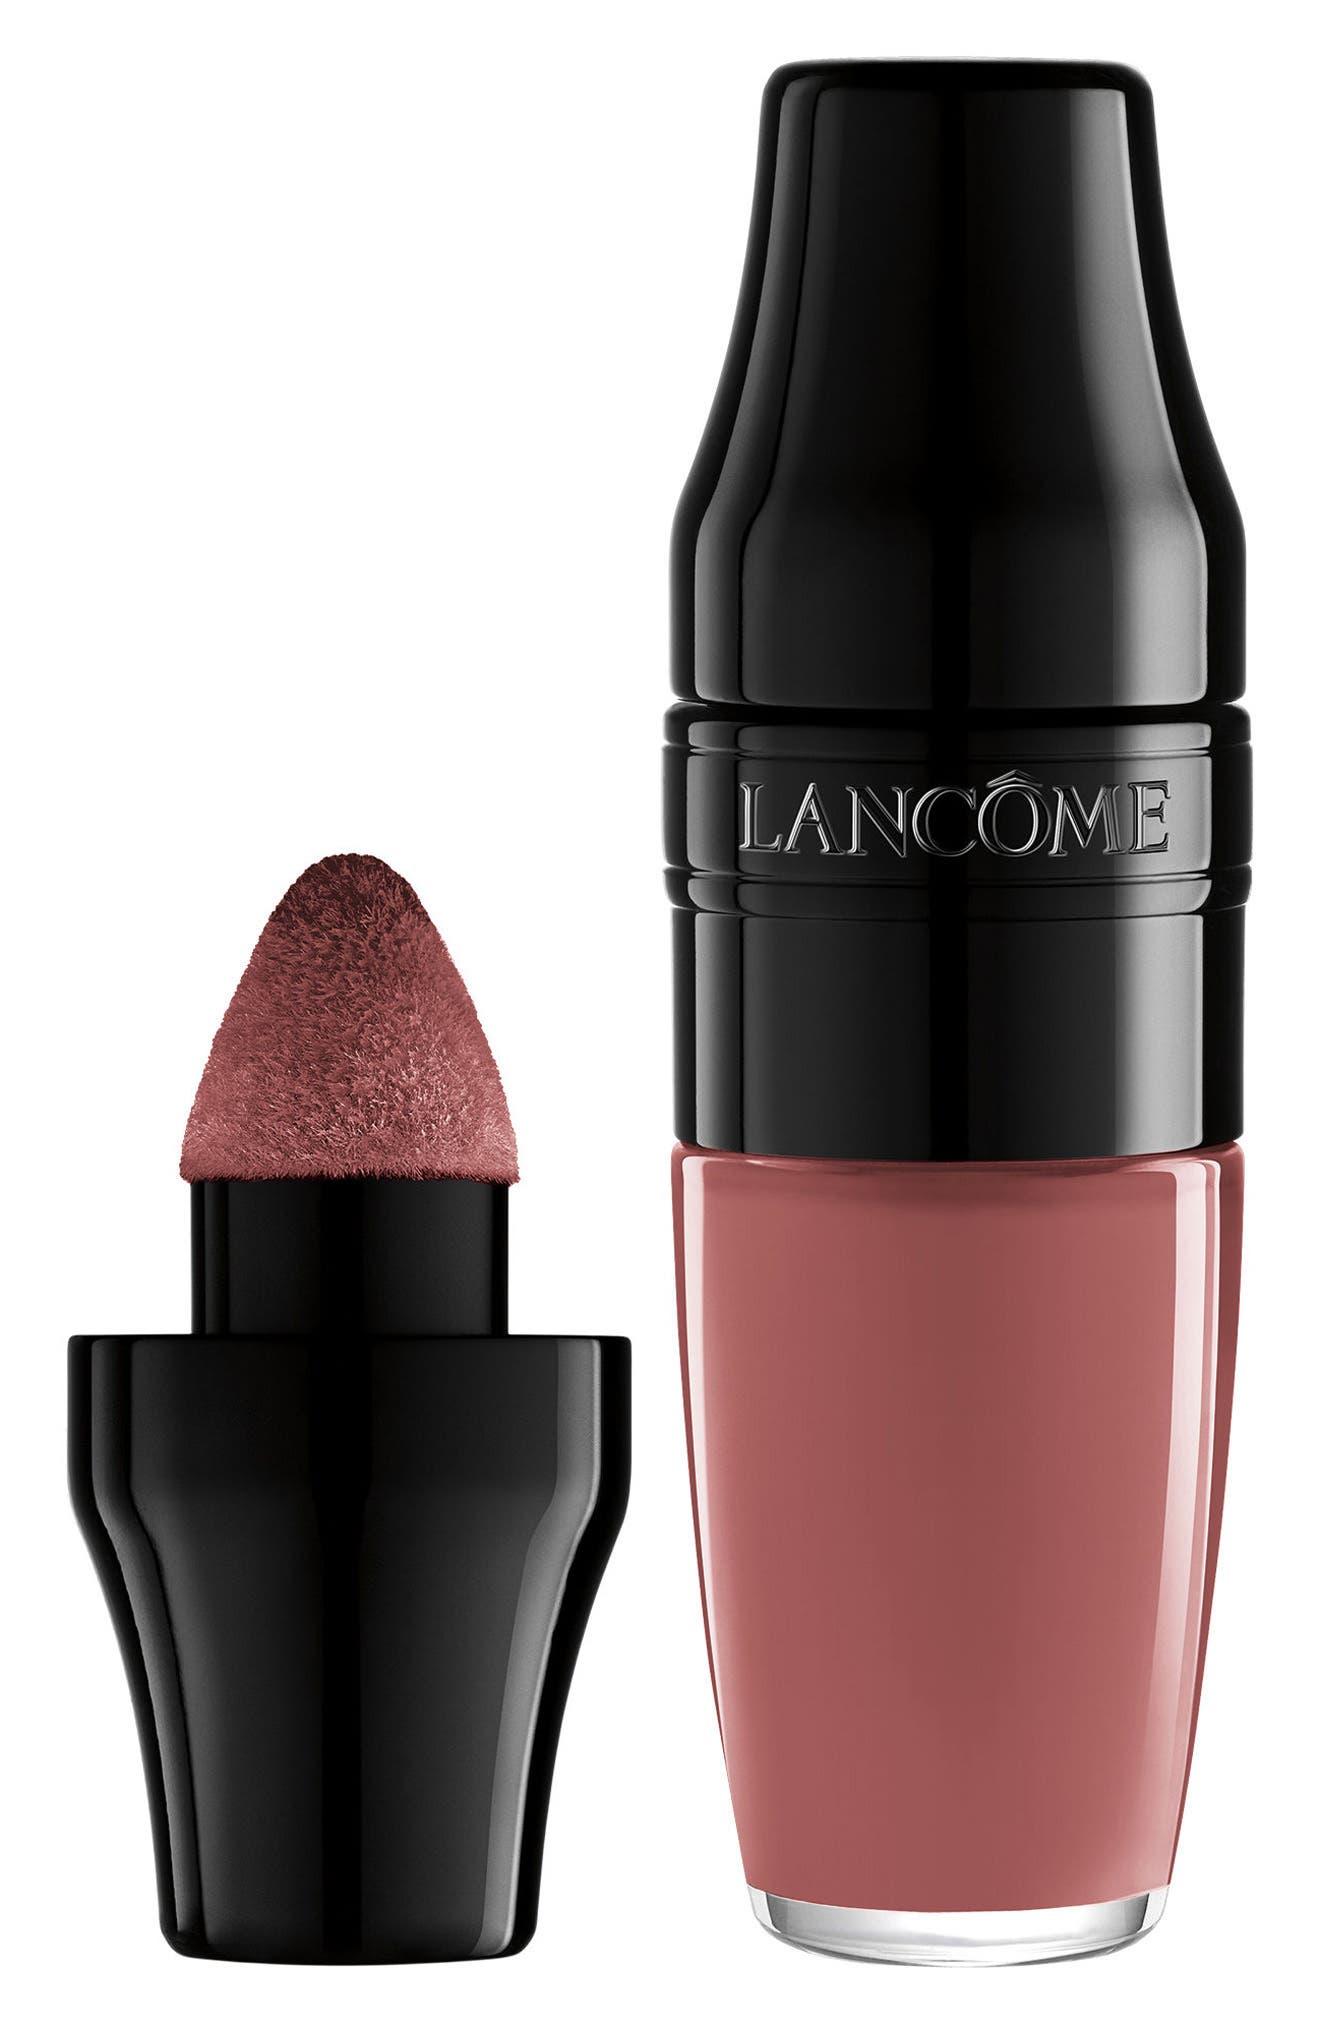 Alternate Image 1 Selected - Lancôme Matte Shaker High Pigment Liquid Lipstick